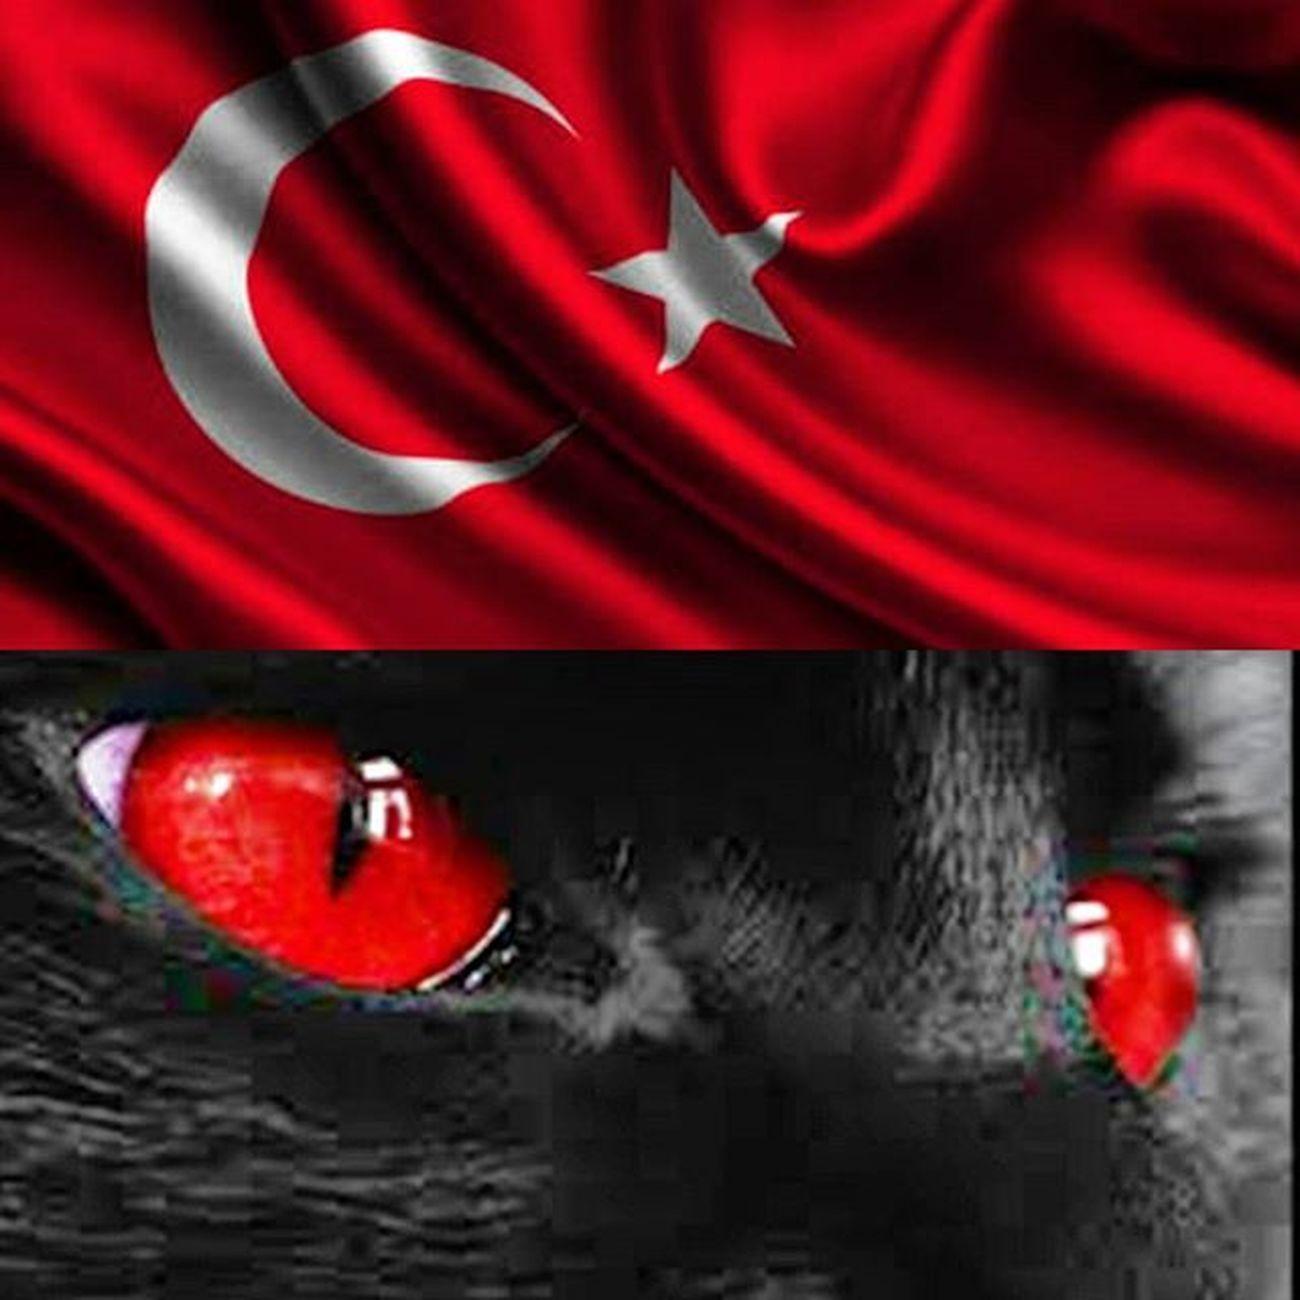 HATE TERROR.... Istanbul Türkiye Turkey Terror Peace Peacefortheworld Peaceforall Noterrorism Ankara Proud Turkisharmy Army Force Oneland Instamoment Instam Instagram Instagood Instadaily Instamood Insta Instagramers Instagramhub Instagram_turkey